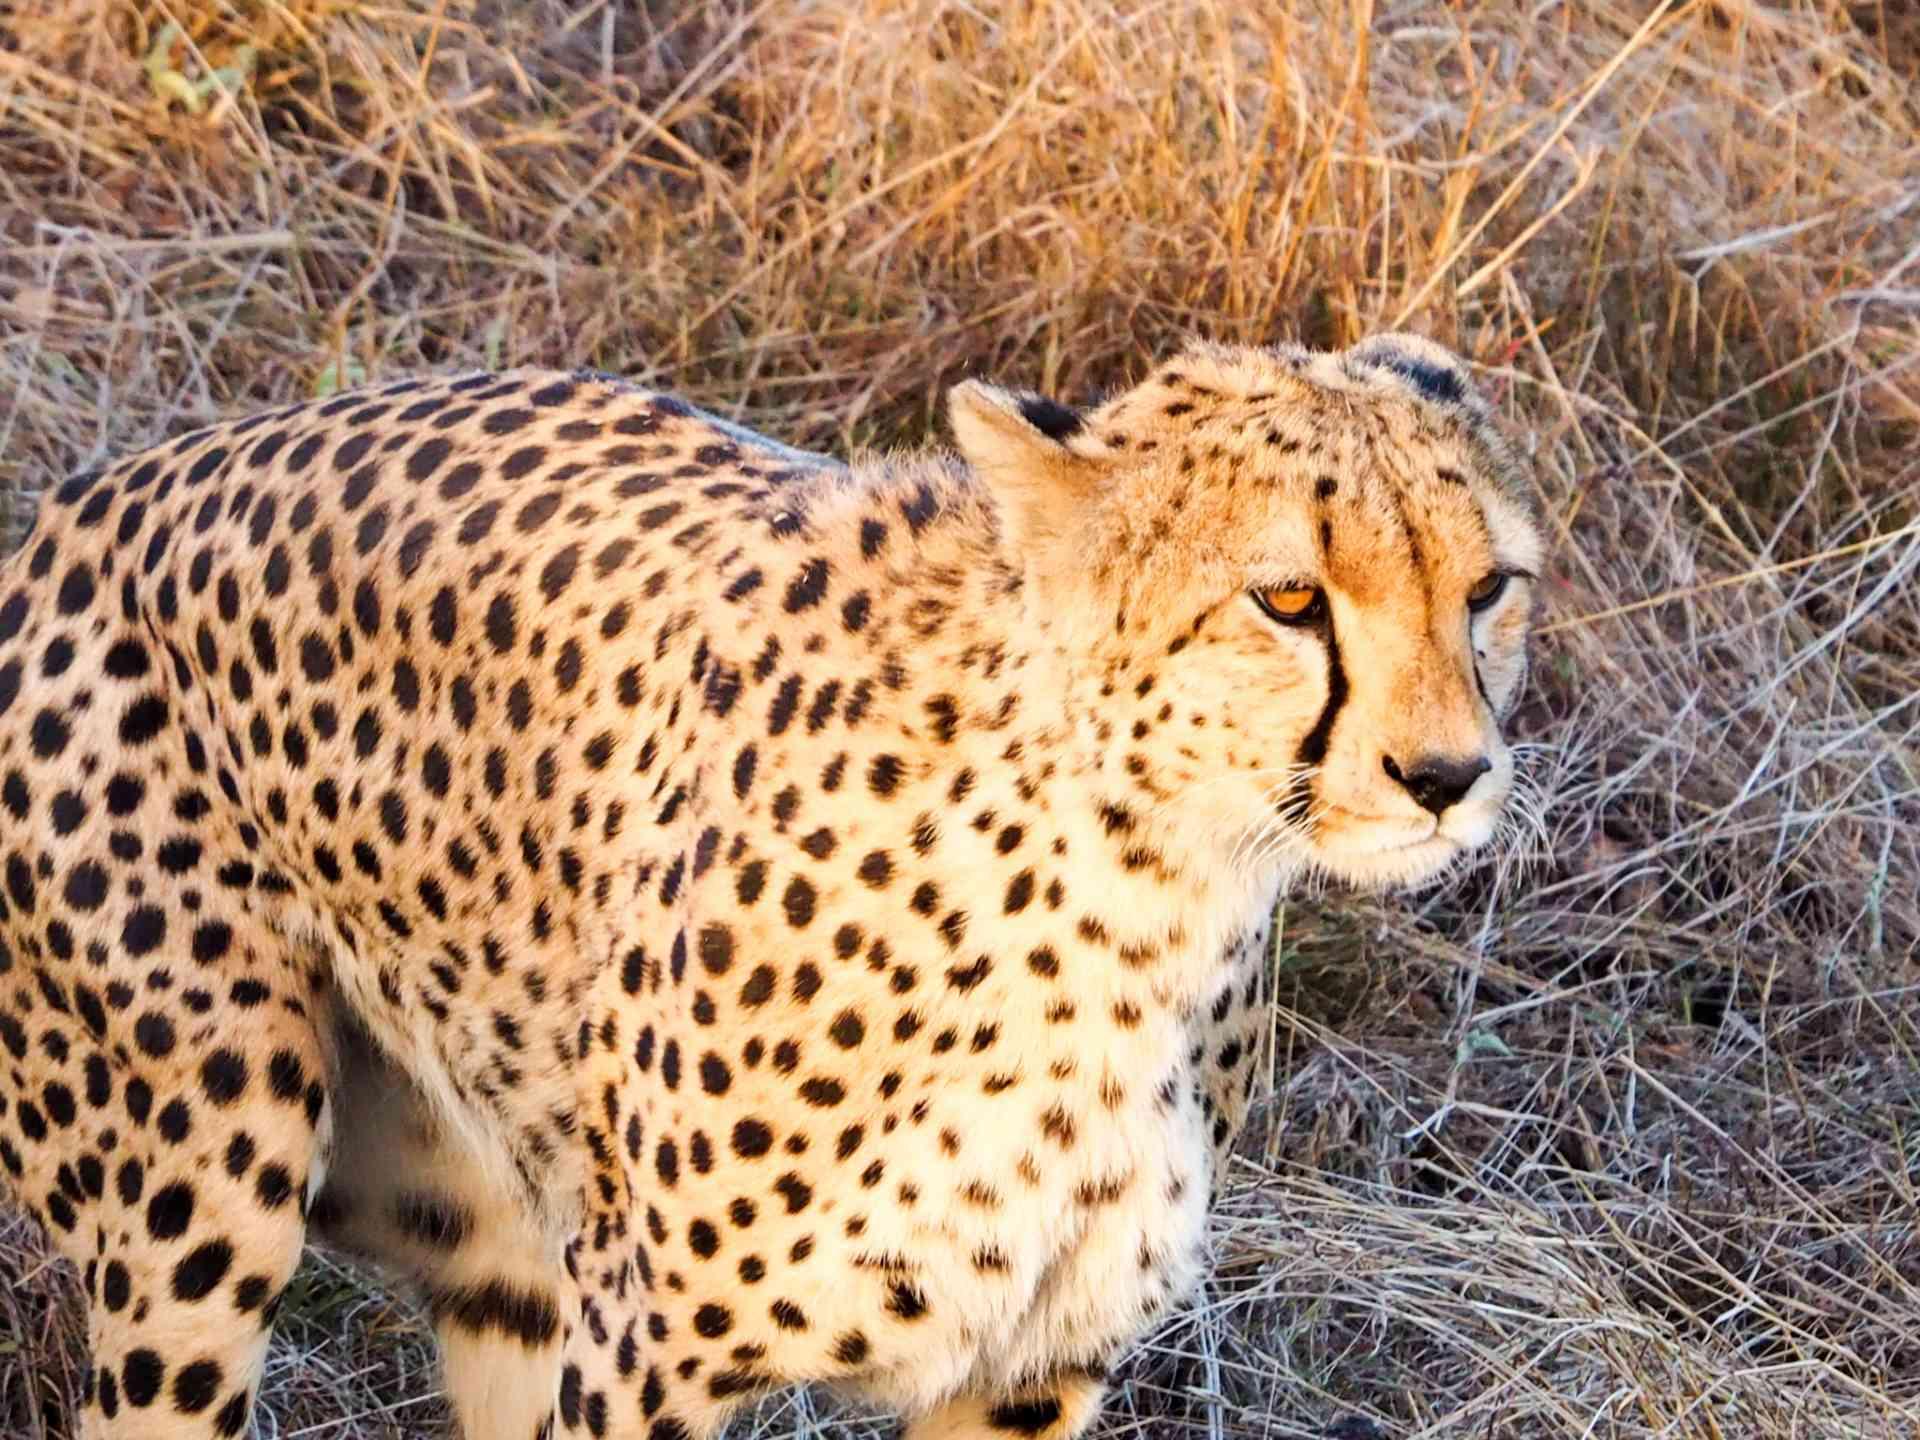 Cheetah, Maasai Mara, Kenya by Emily Fraser